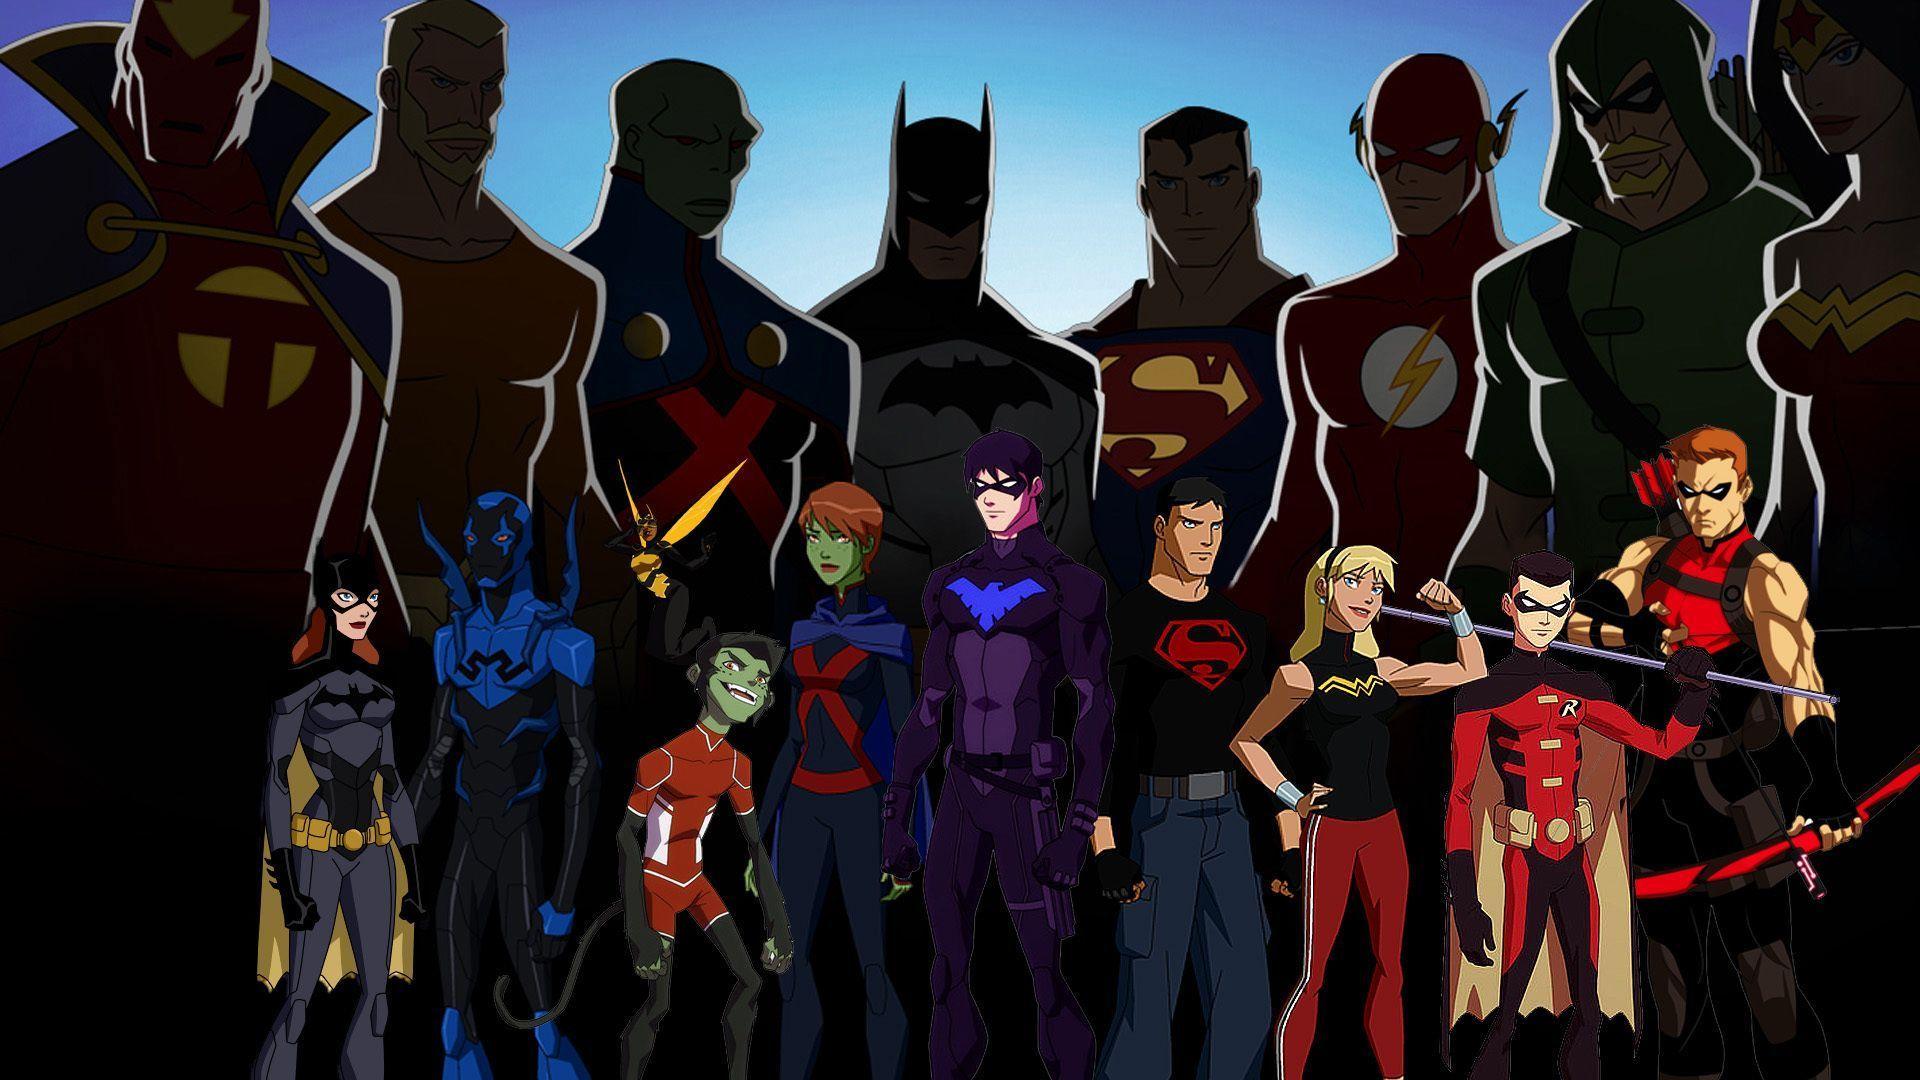 Hd wallpaper justice league - Justice League Wallpaper Hd